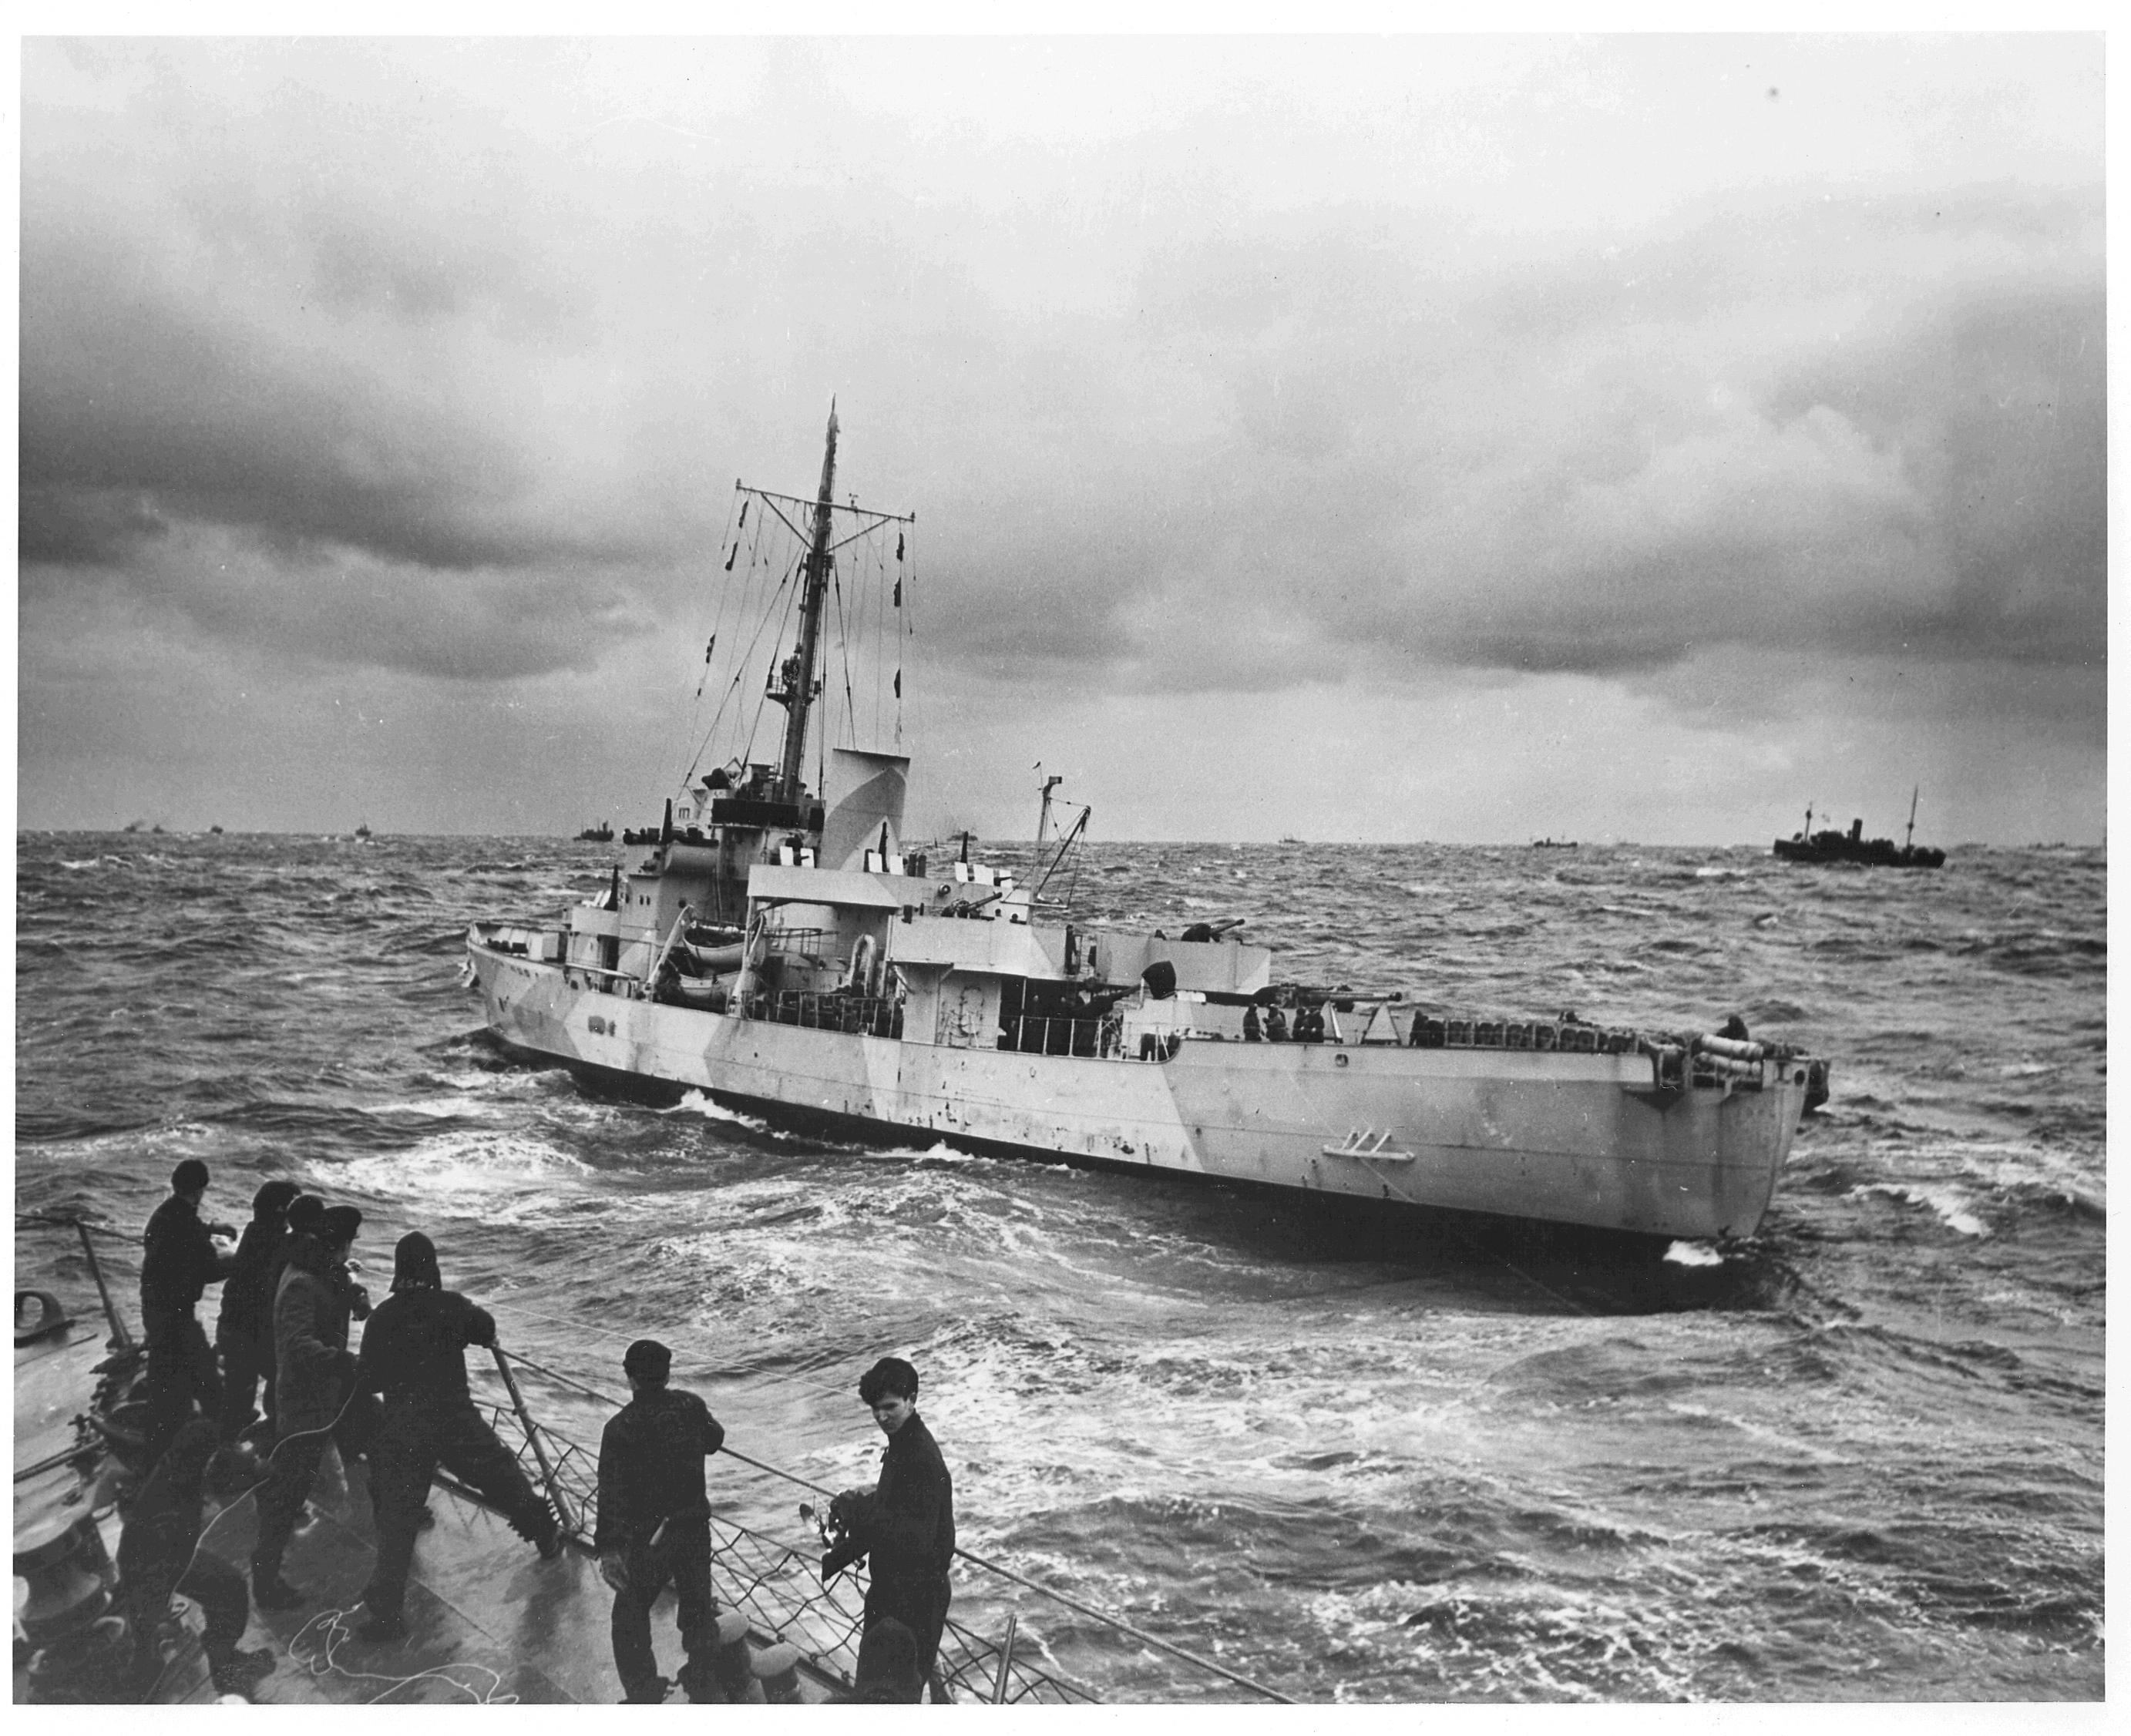 https://i0.wp.com/upload.wikimedia.org/wikipedia/commons/8/83/USCGC_Spencer_WPG-36.jpg